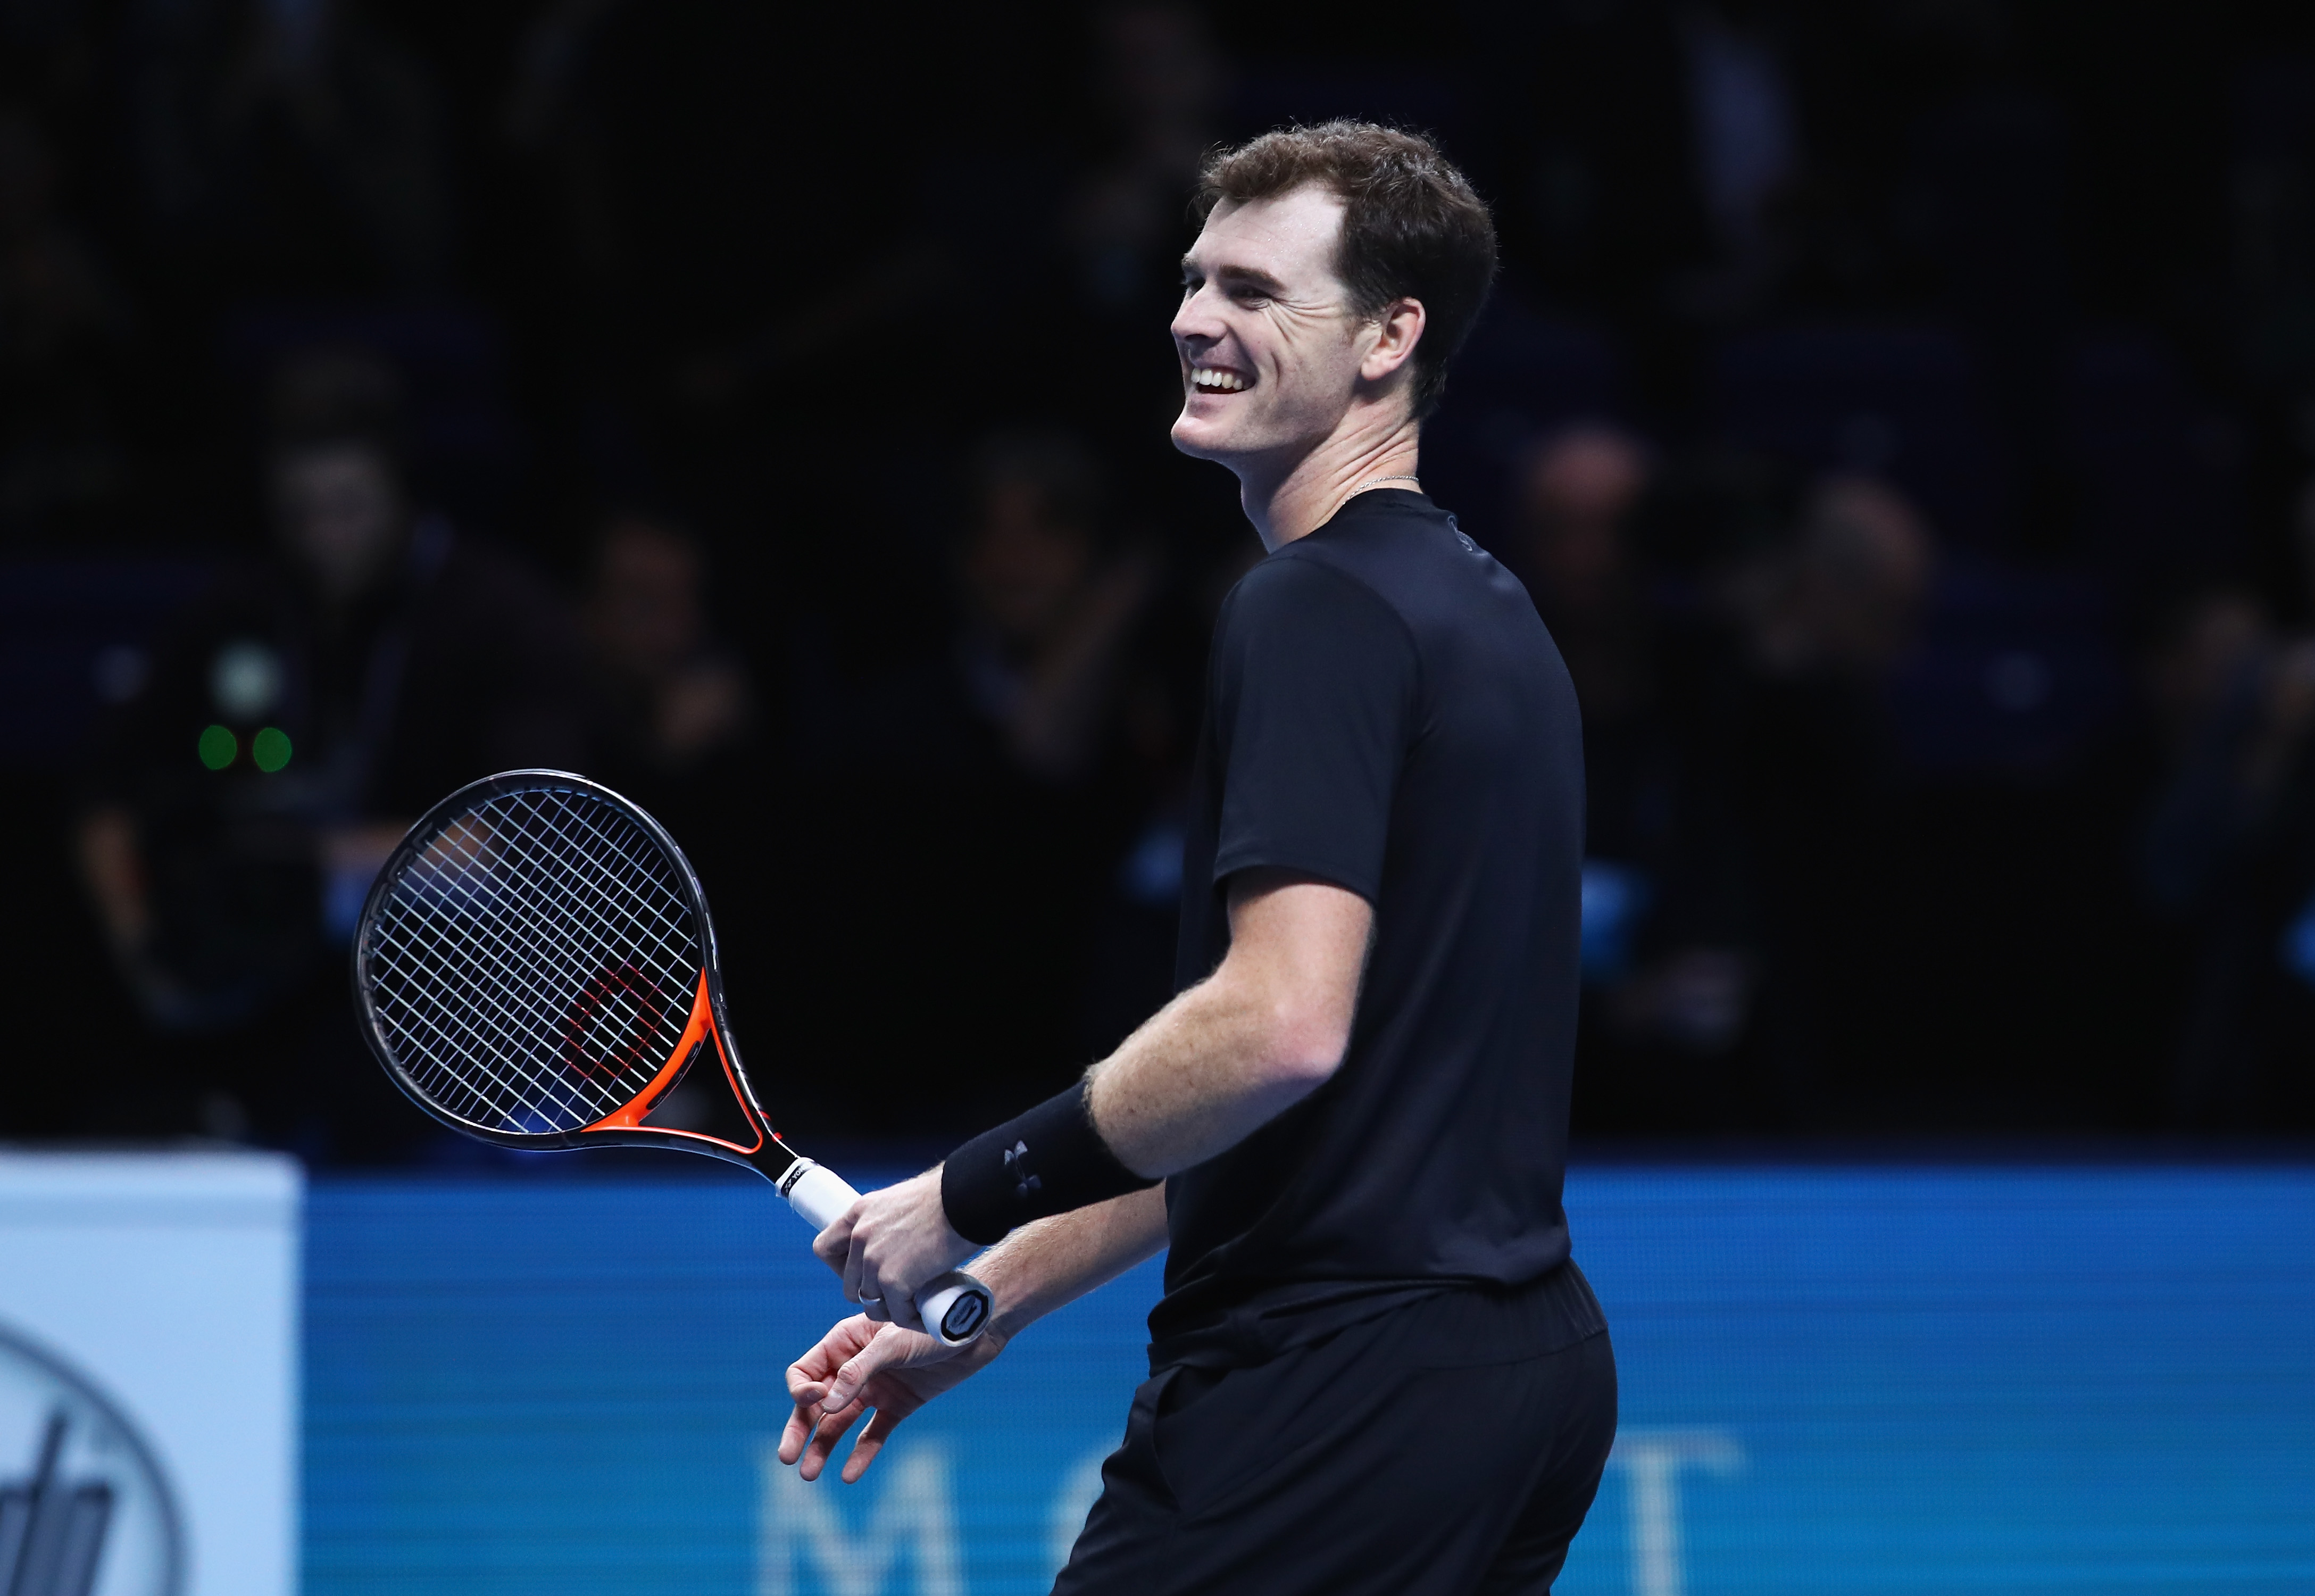 Double Murray No. 1s is on! Jamie secures top ranking spot as Pierre-Hugues Herbert Nicolas Mahut lose